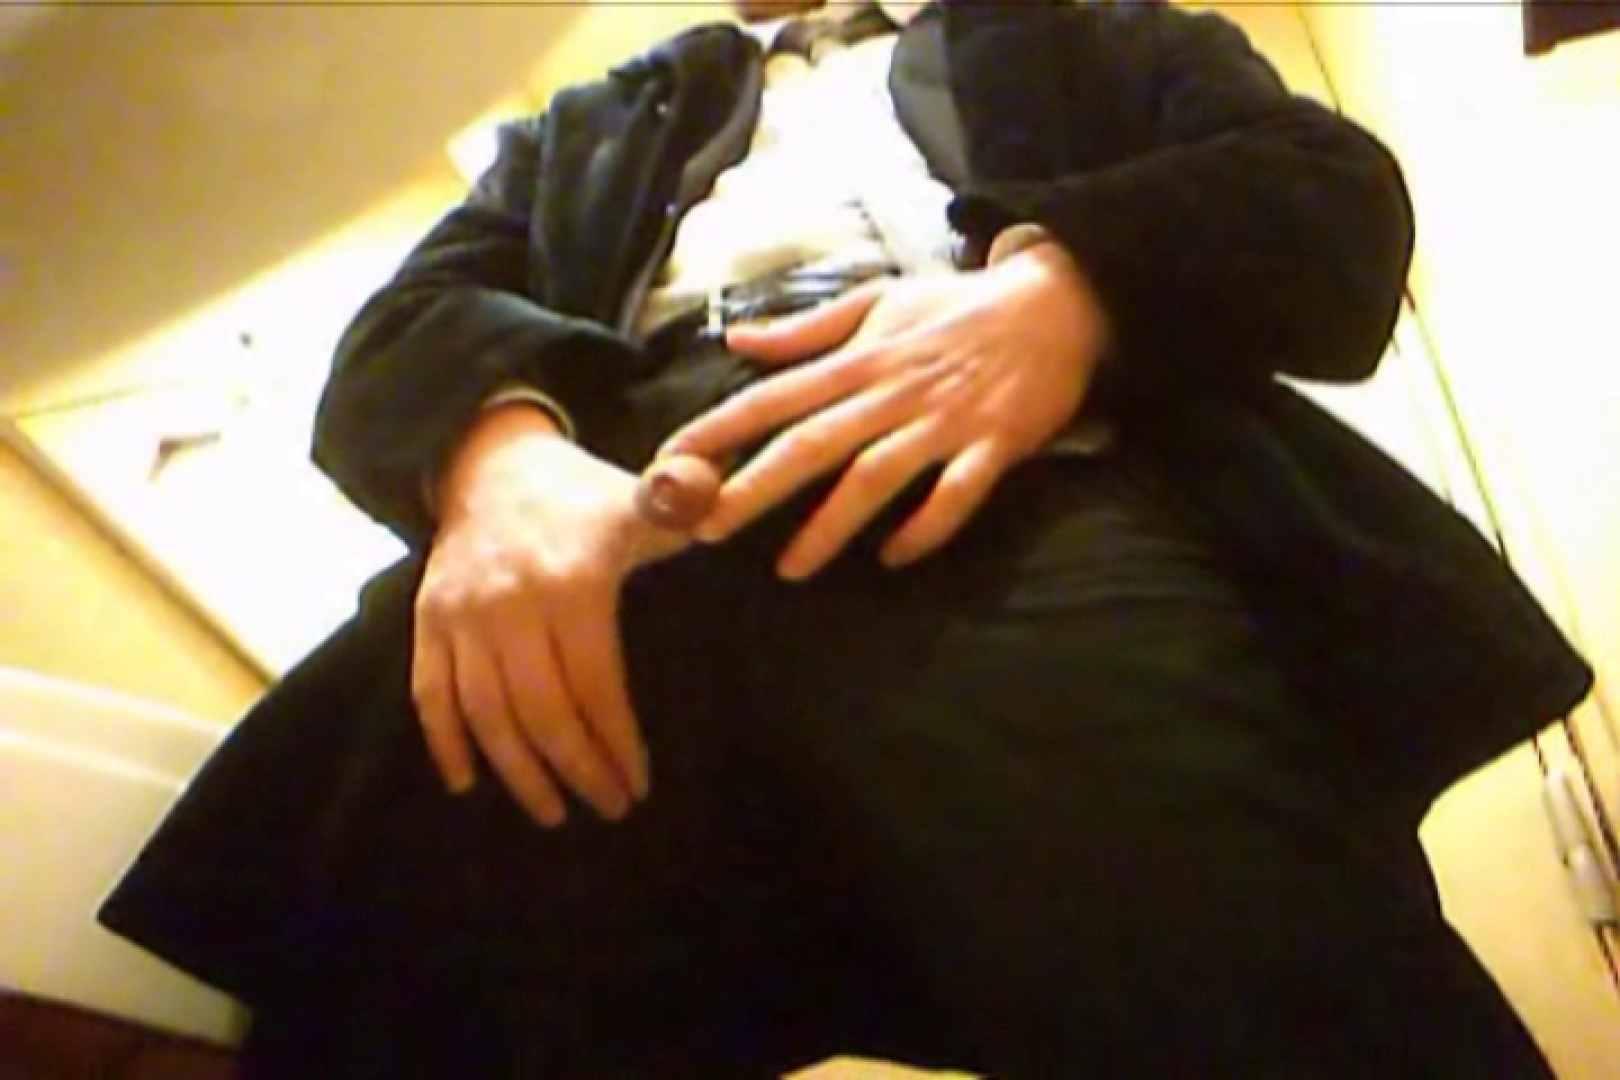 SEASON 2ND!掴み取りさんの洗面所覗き!in新幹線!VOL.12 スーツ男子 ゲイエロビデオ画像 66枚 25